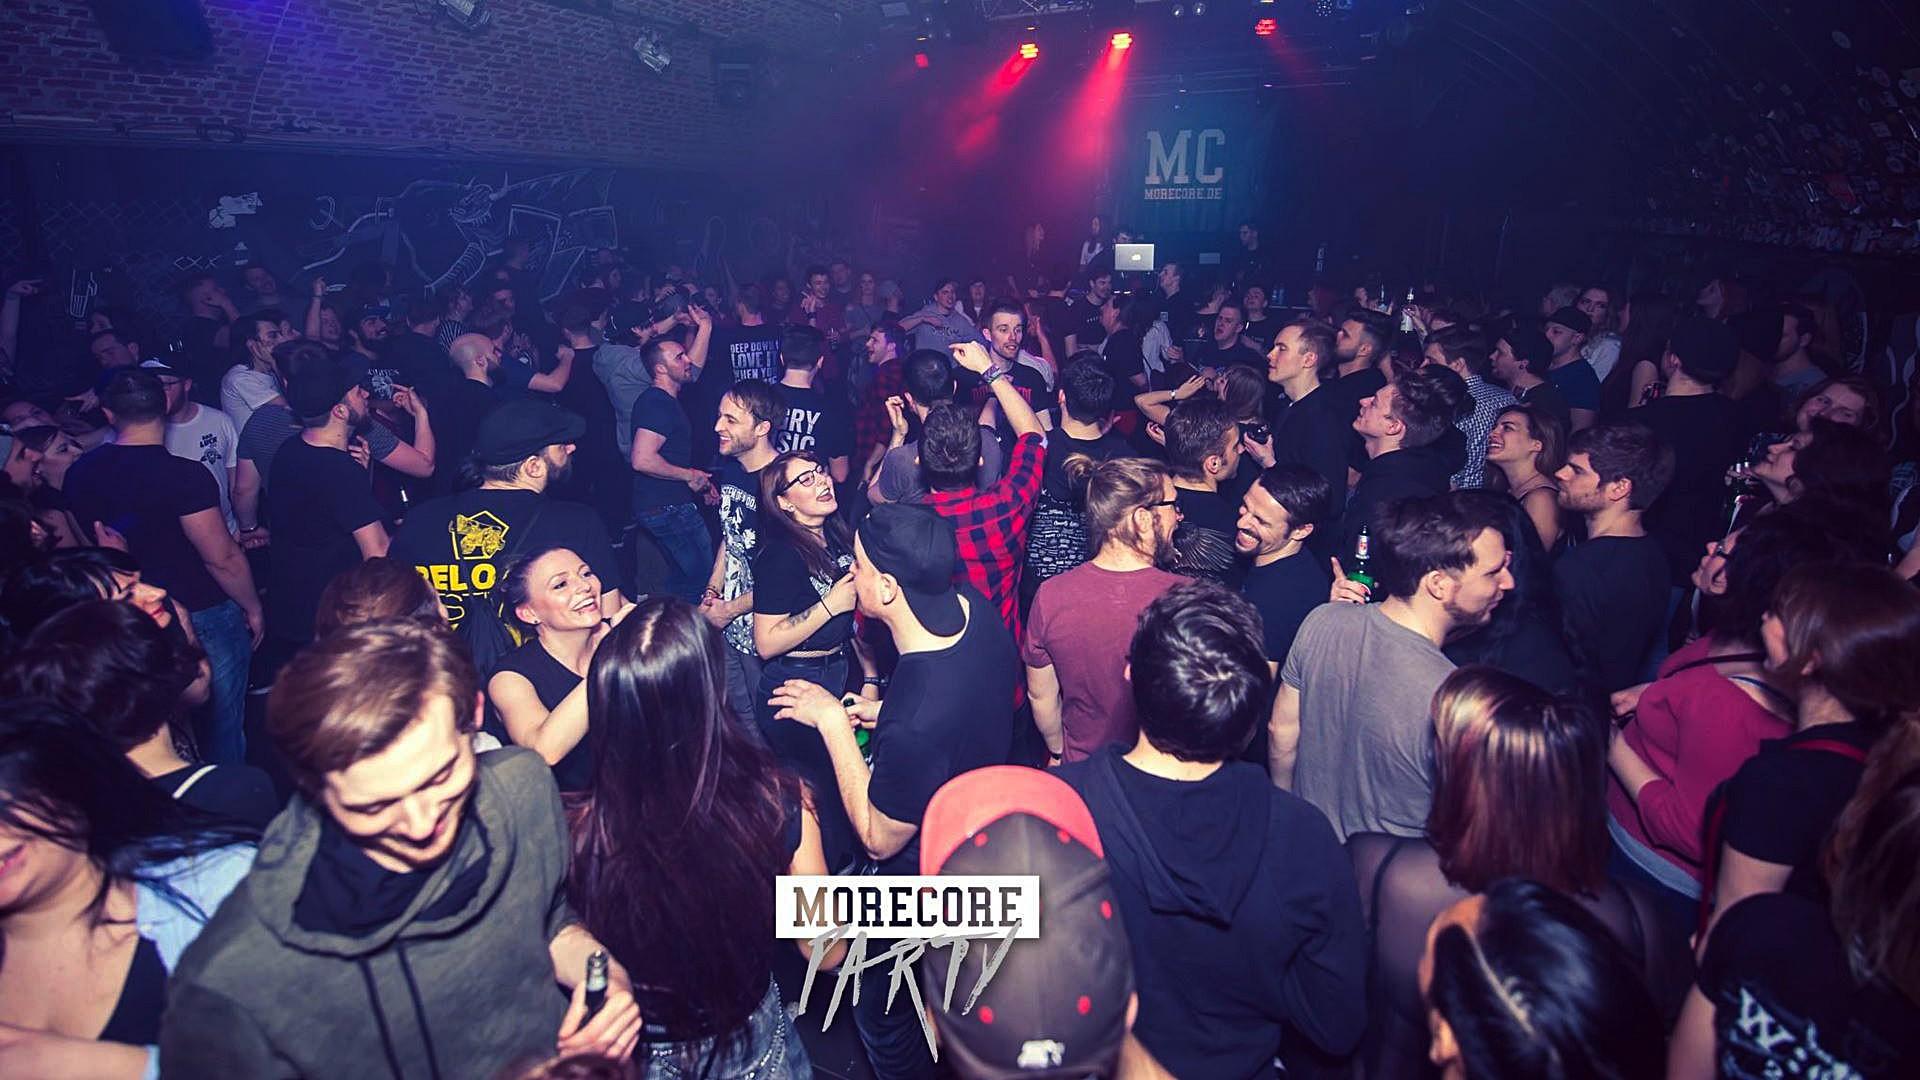 MoreCore Party